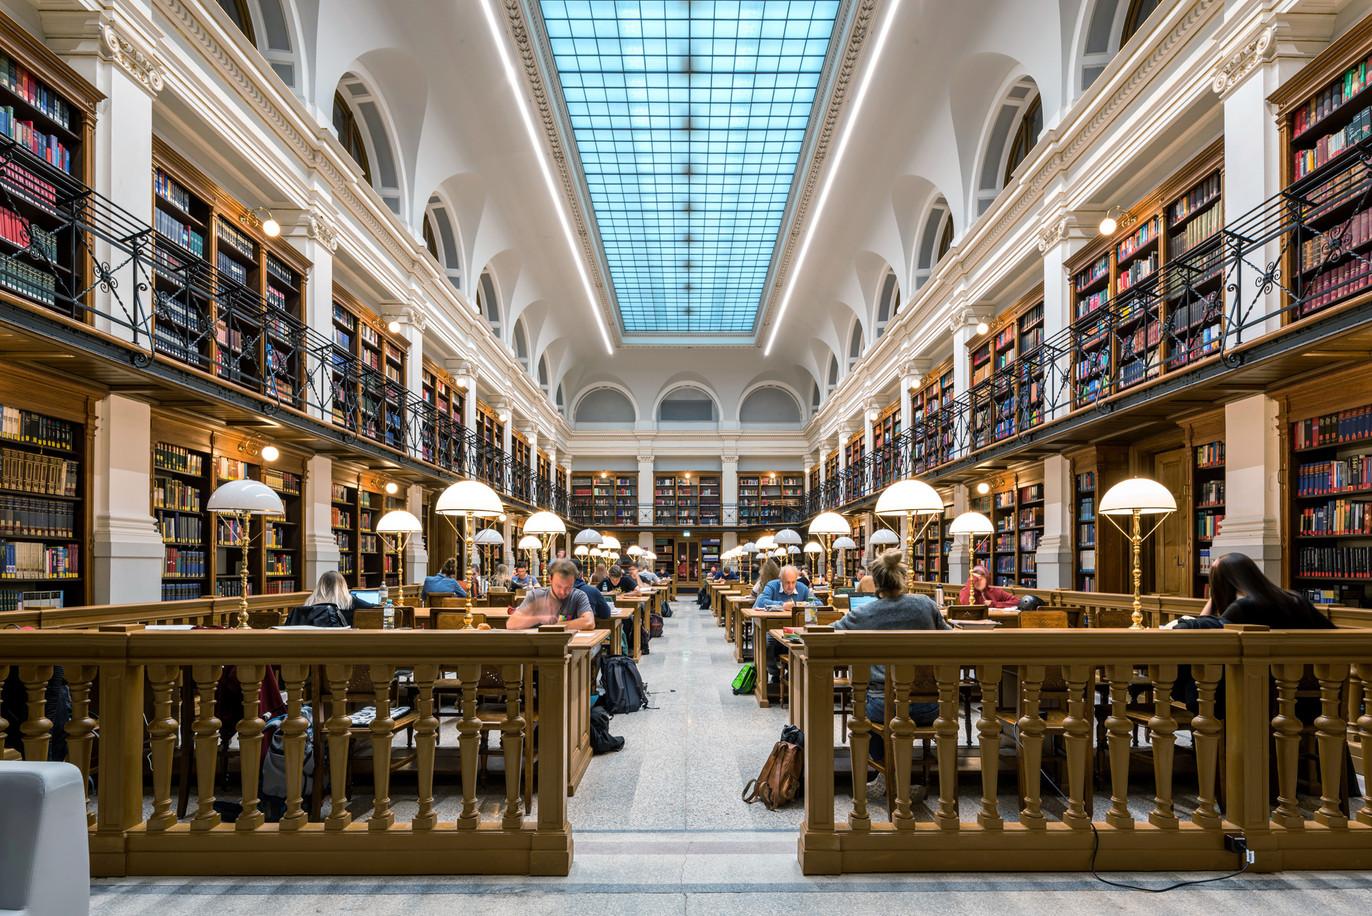 Library-7.jpg